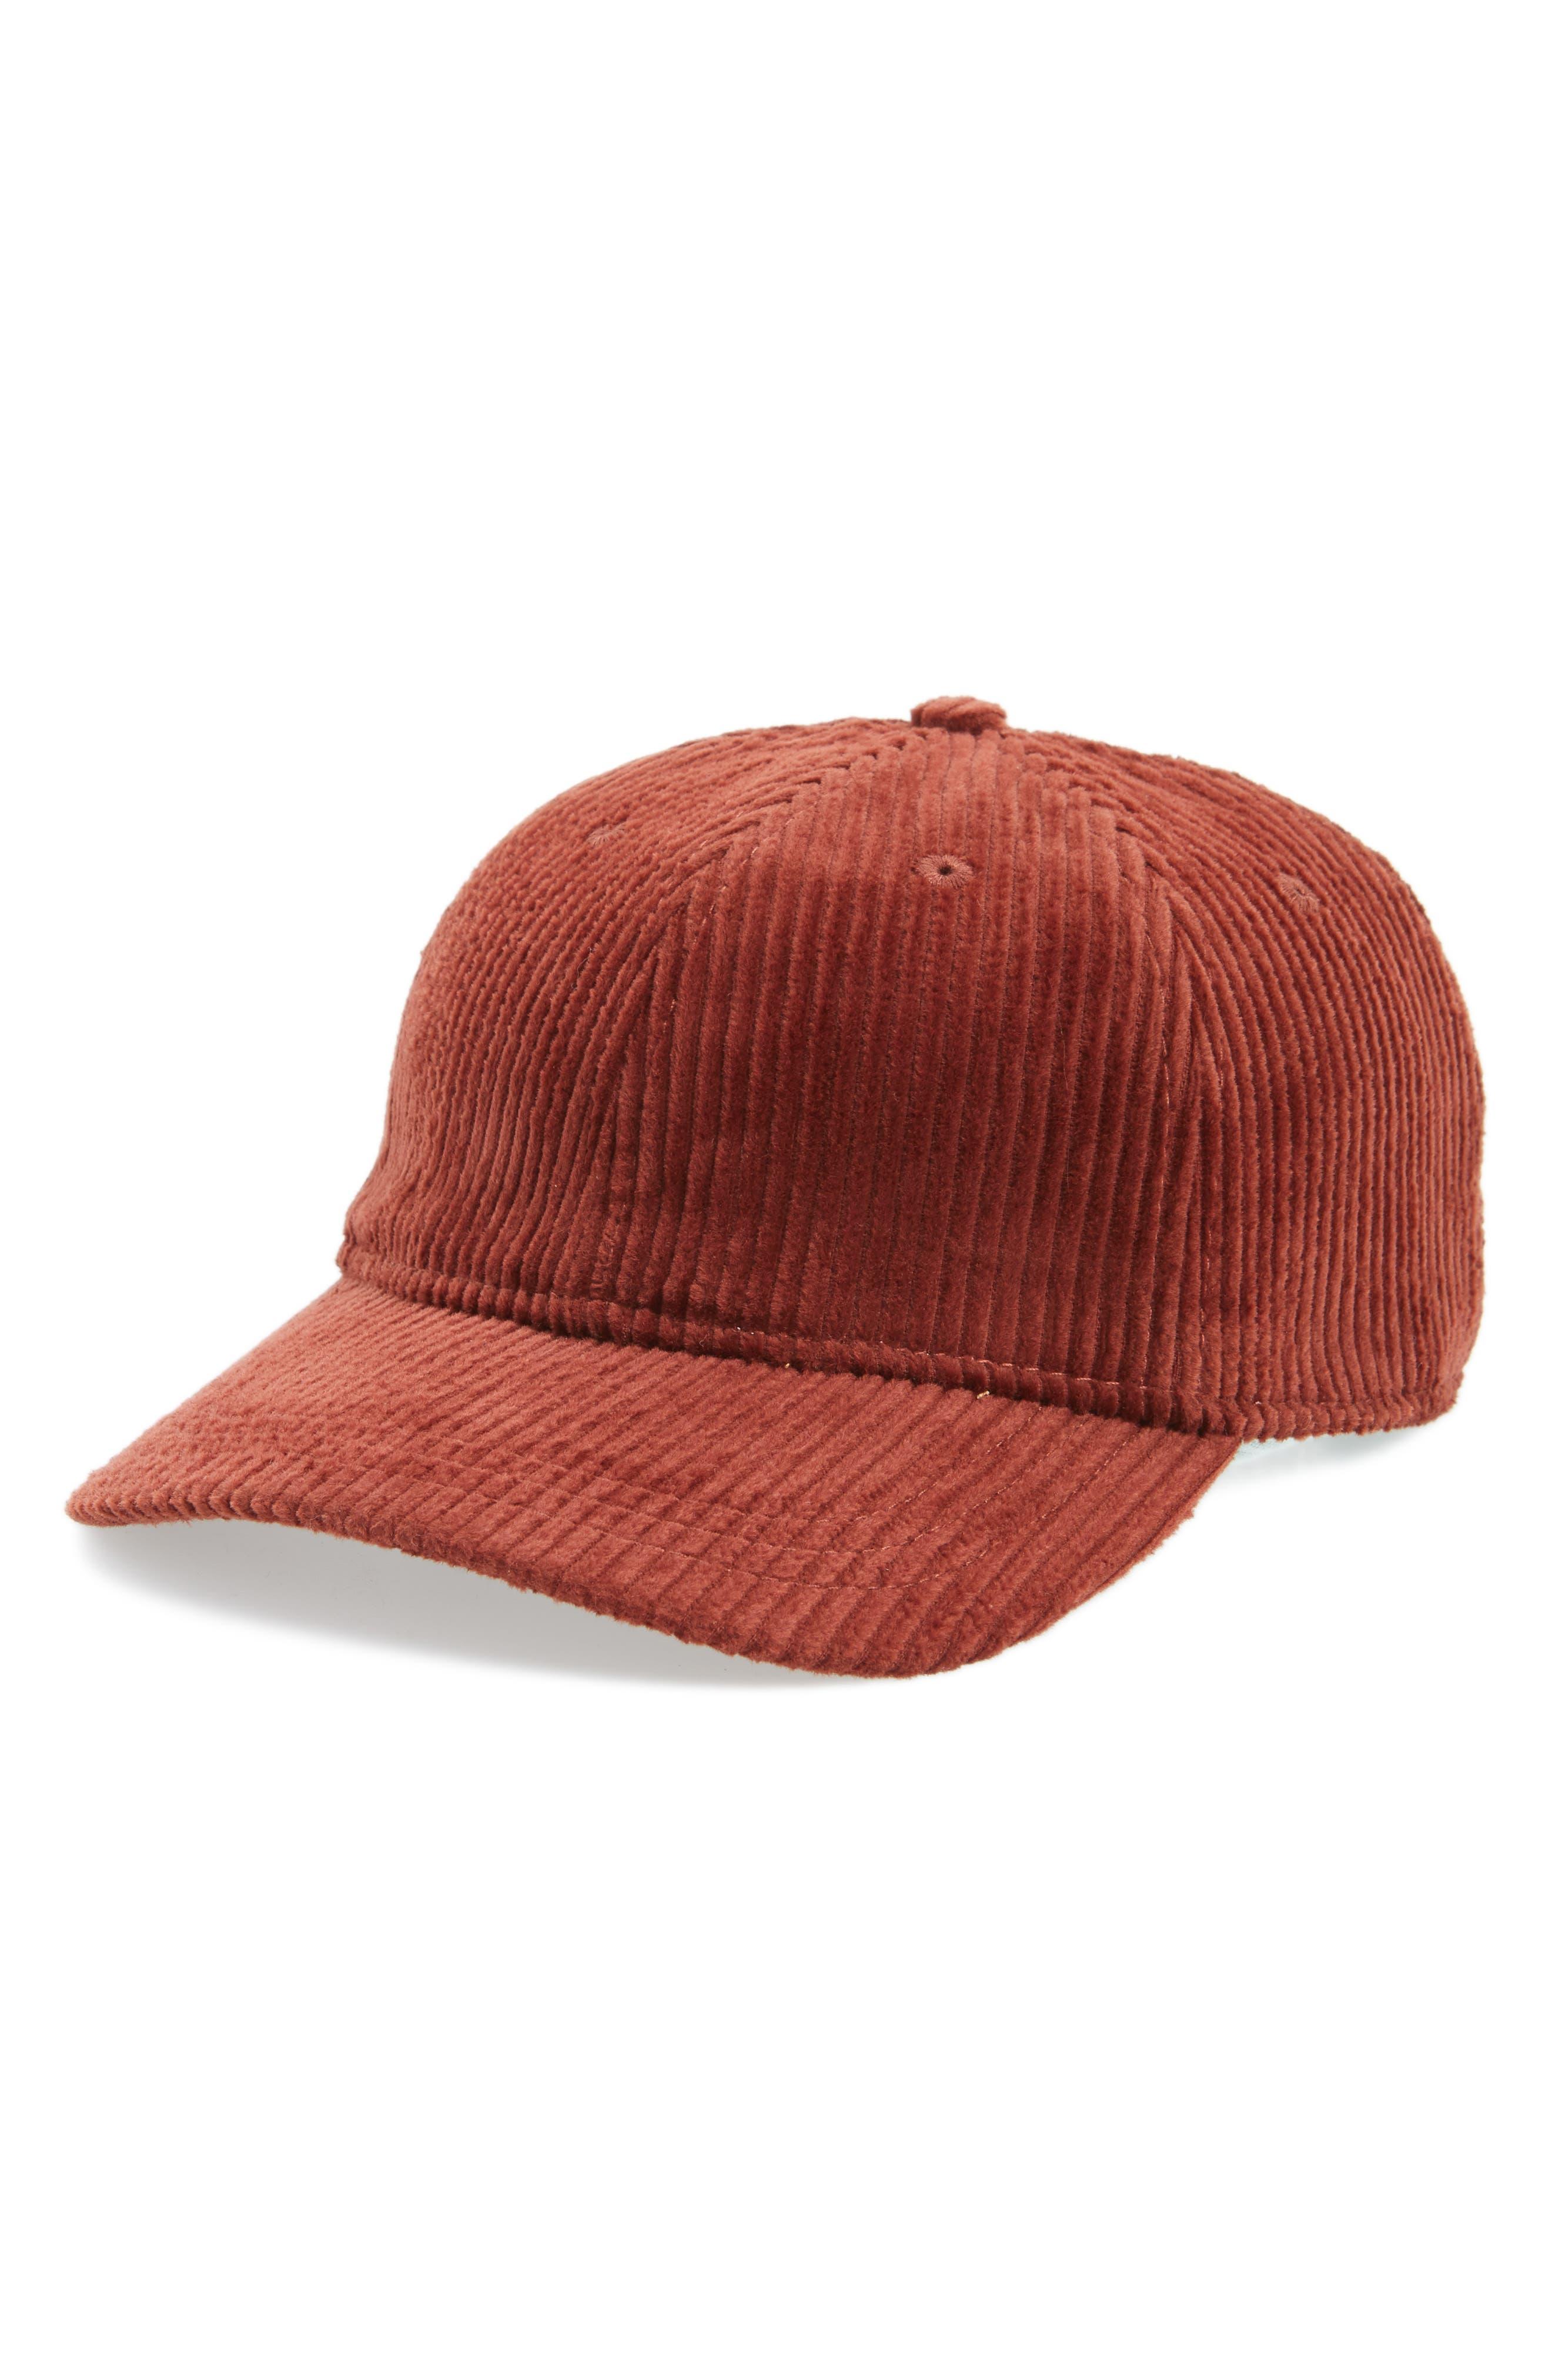 Alternate Image 1 Selected - Madewell Corduroy Baseball Cap